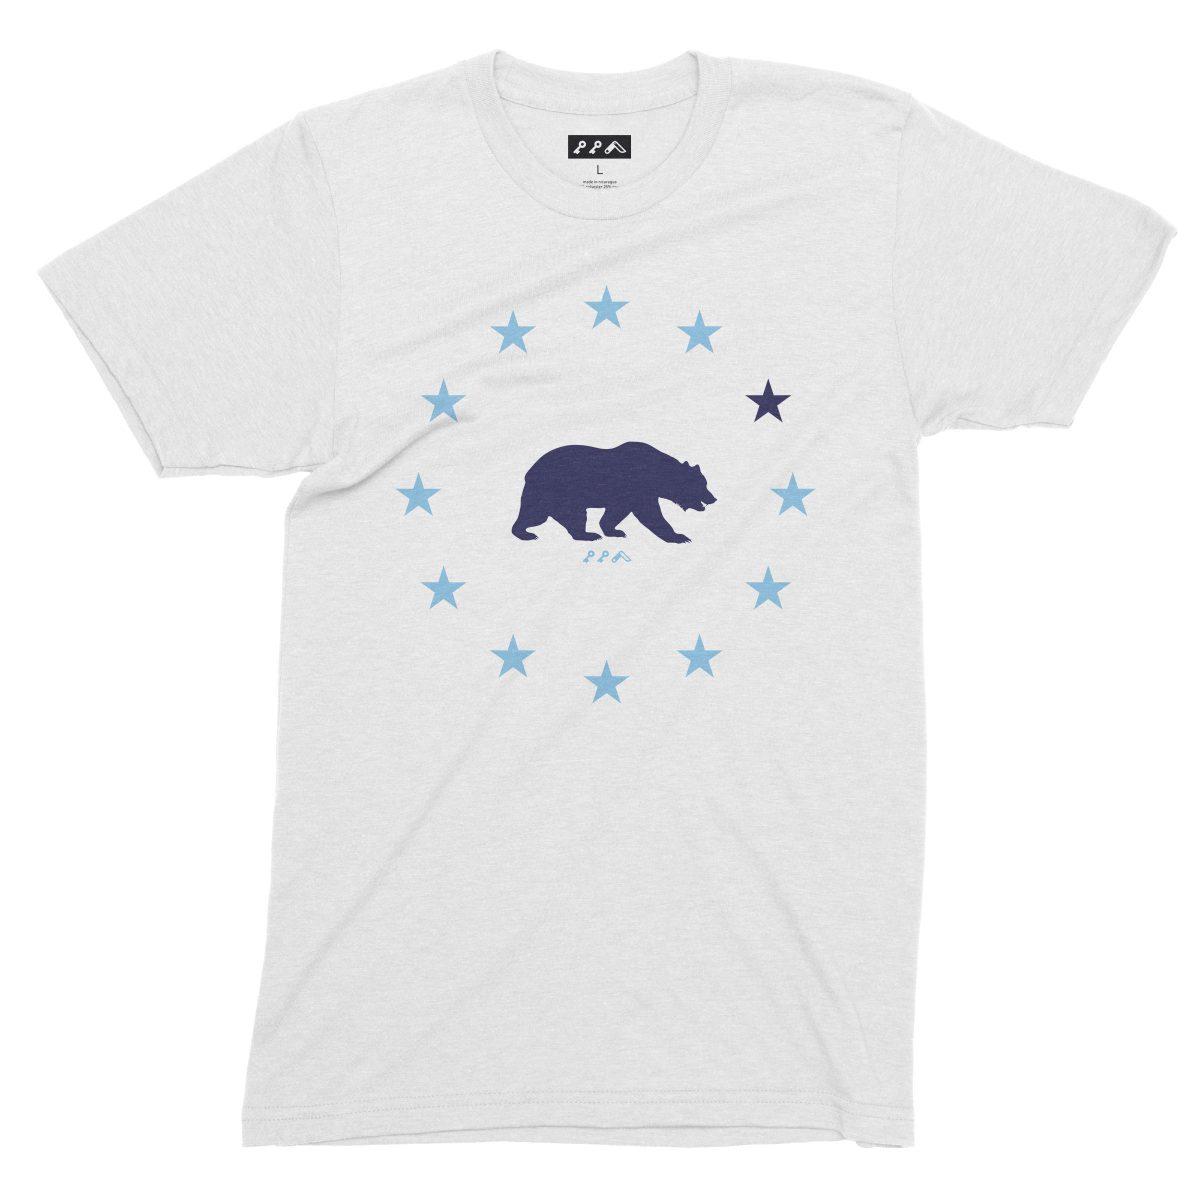 STAR GAZING california republic cal bears tees in white